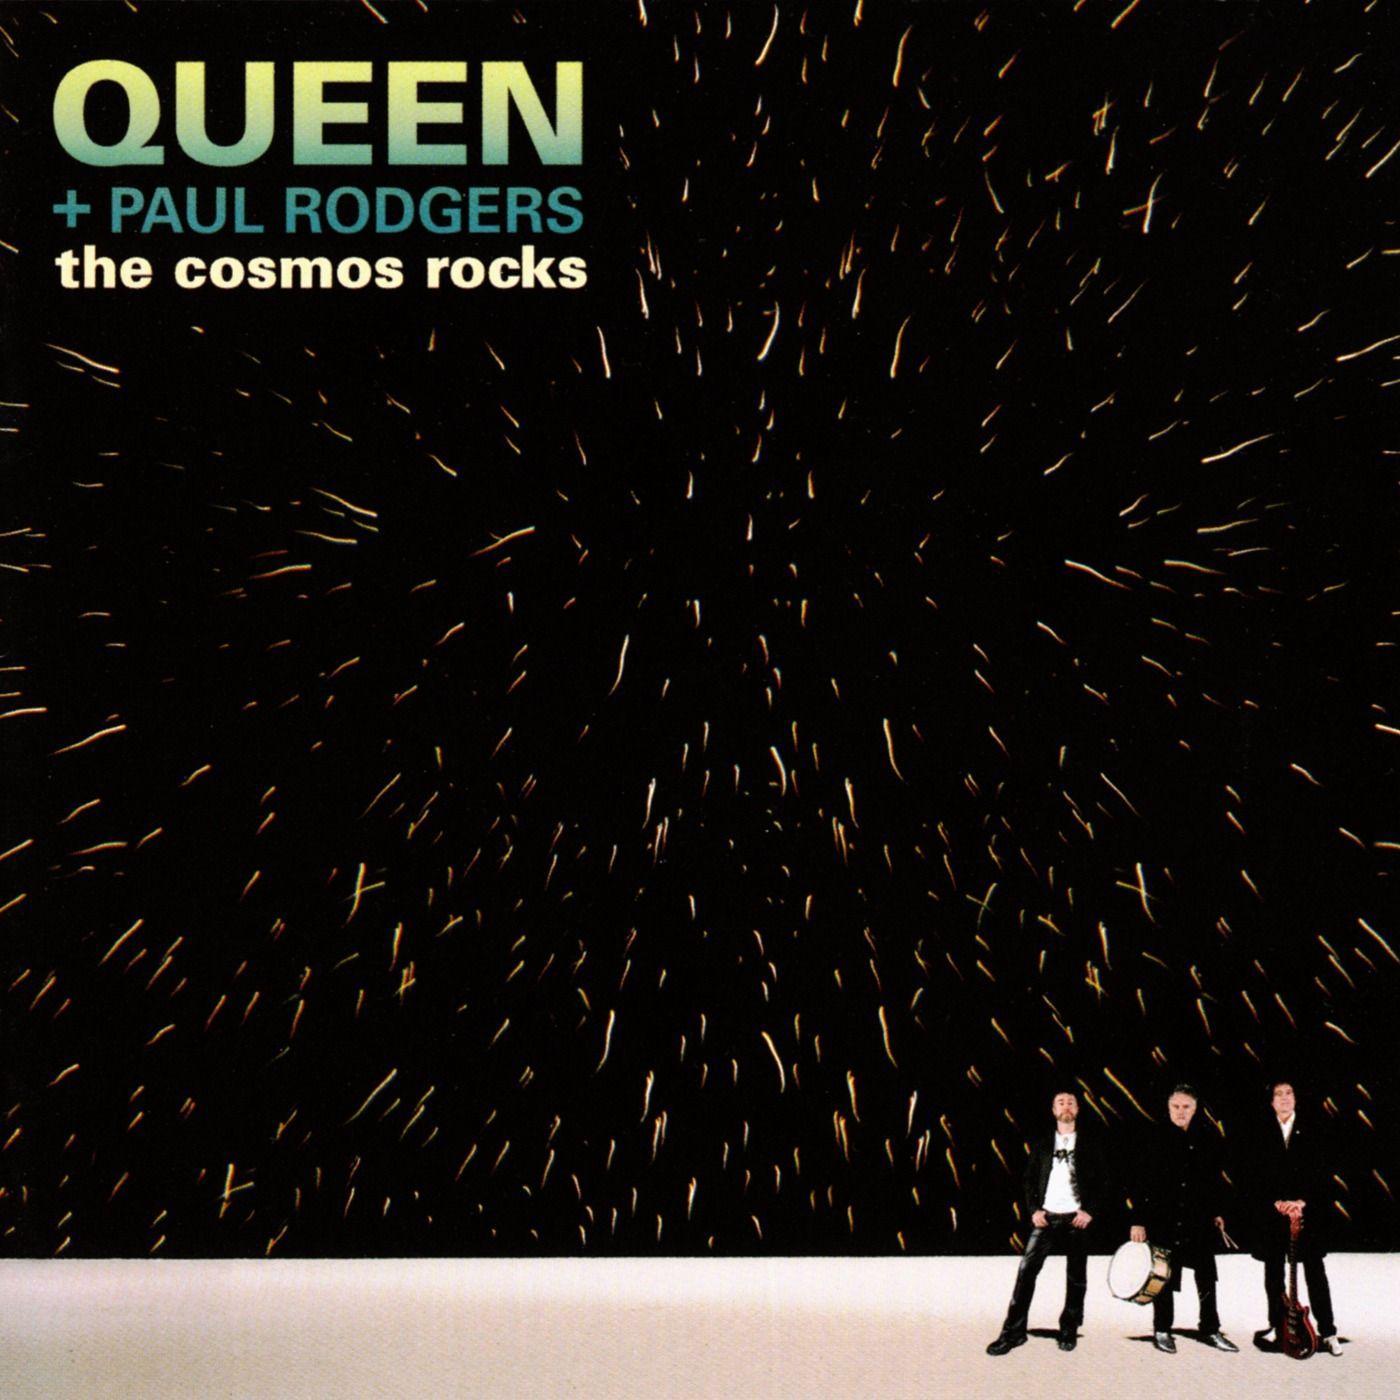 Queen - The Cosmos Rocks album cover